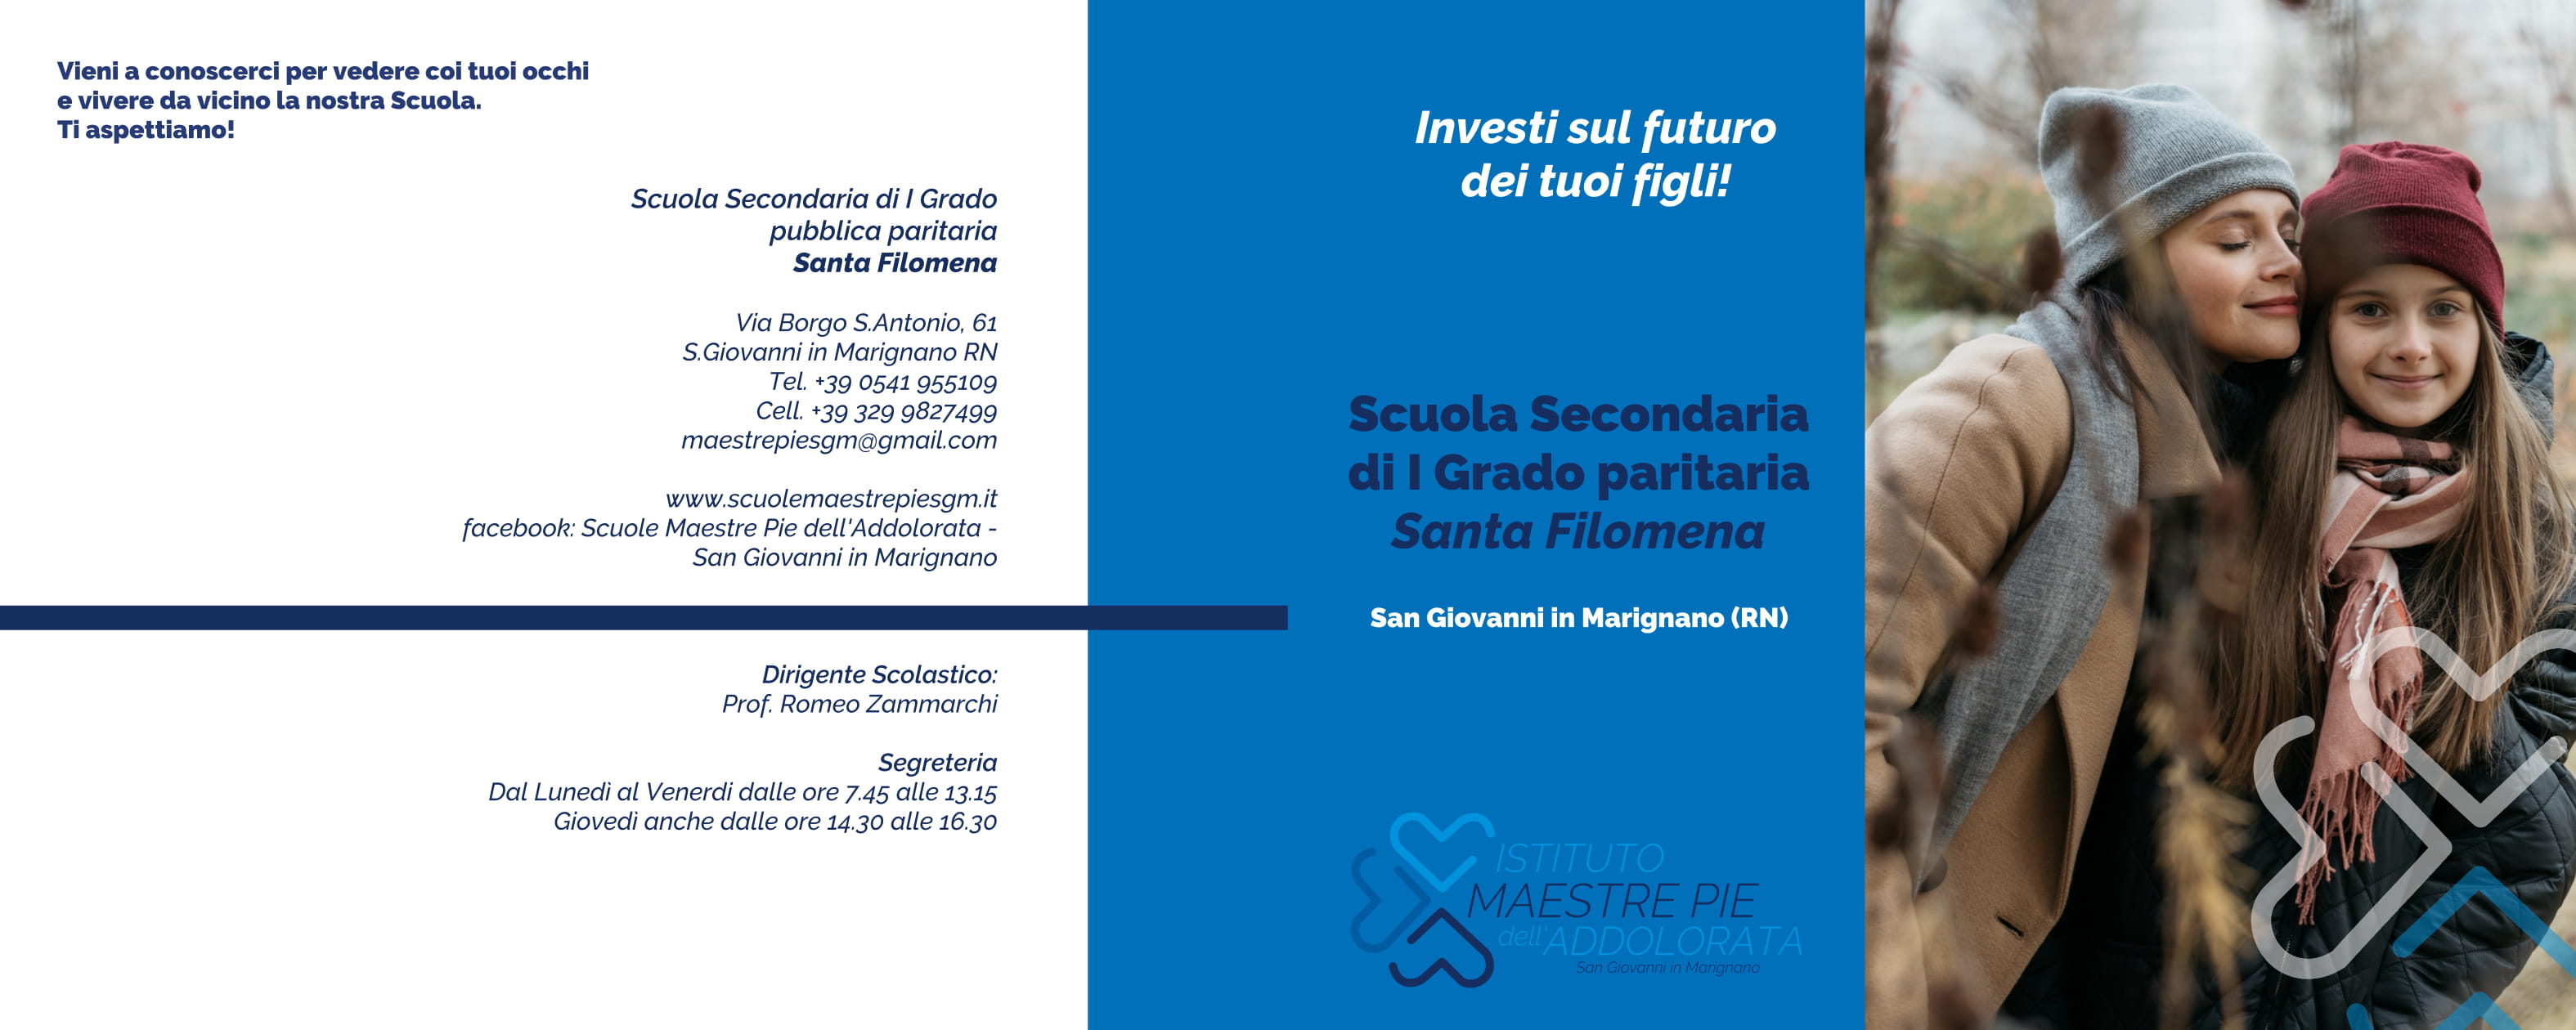 Brochure scuola Secondaria I grado Santa Filomena